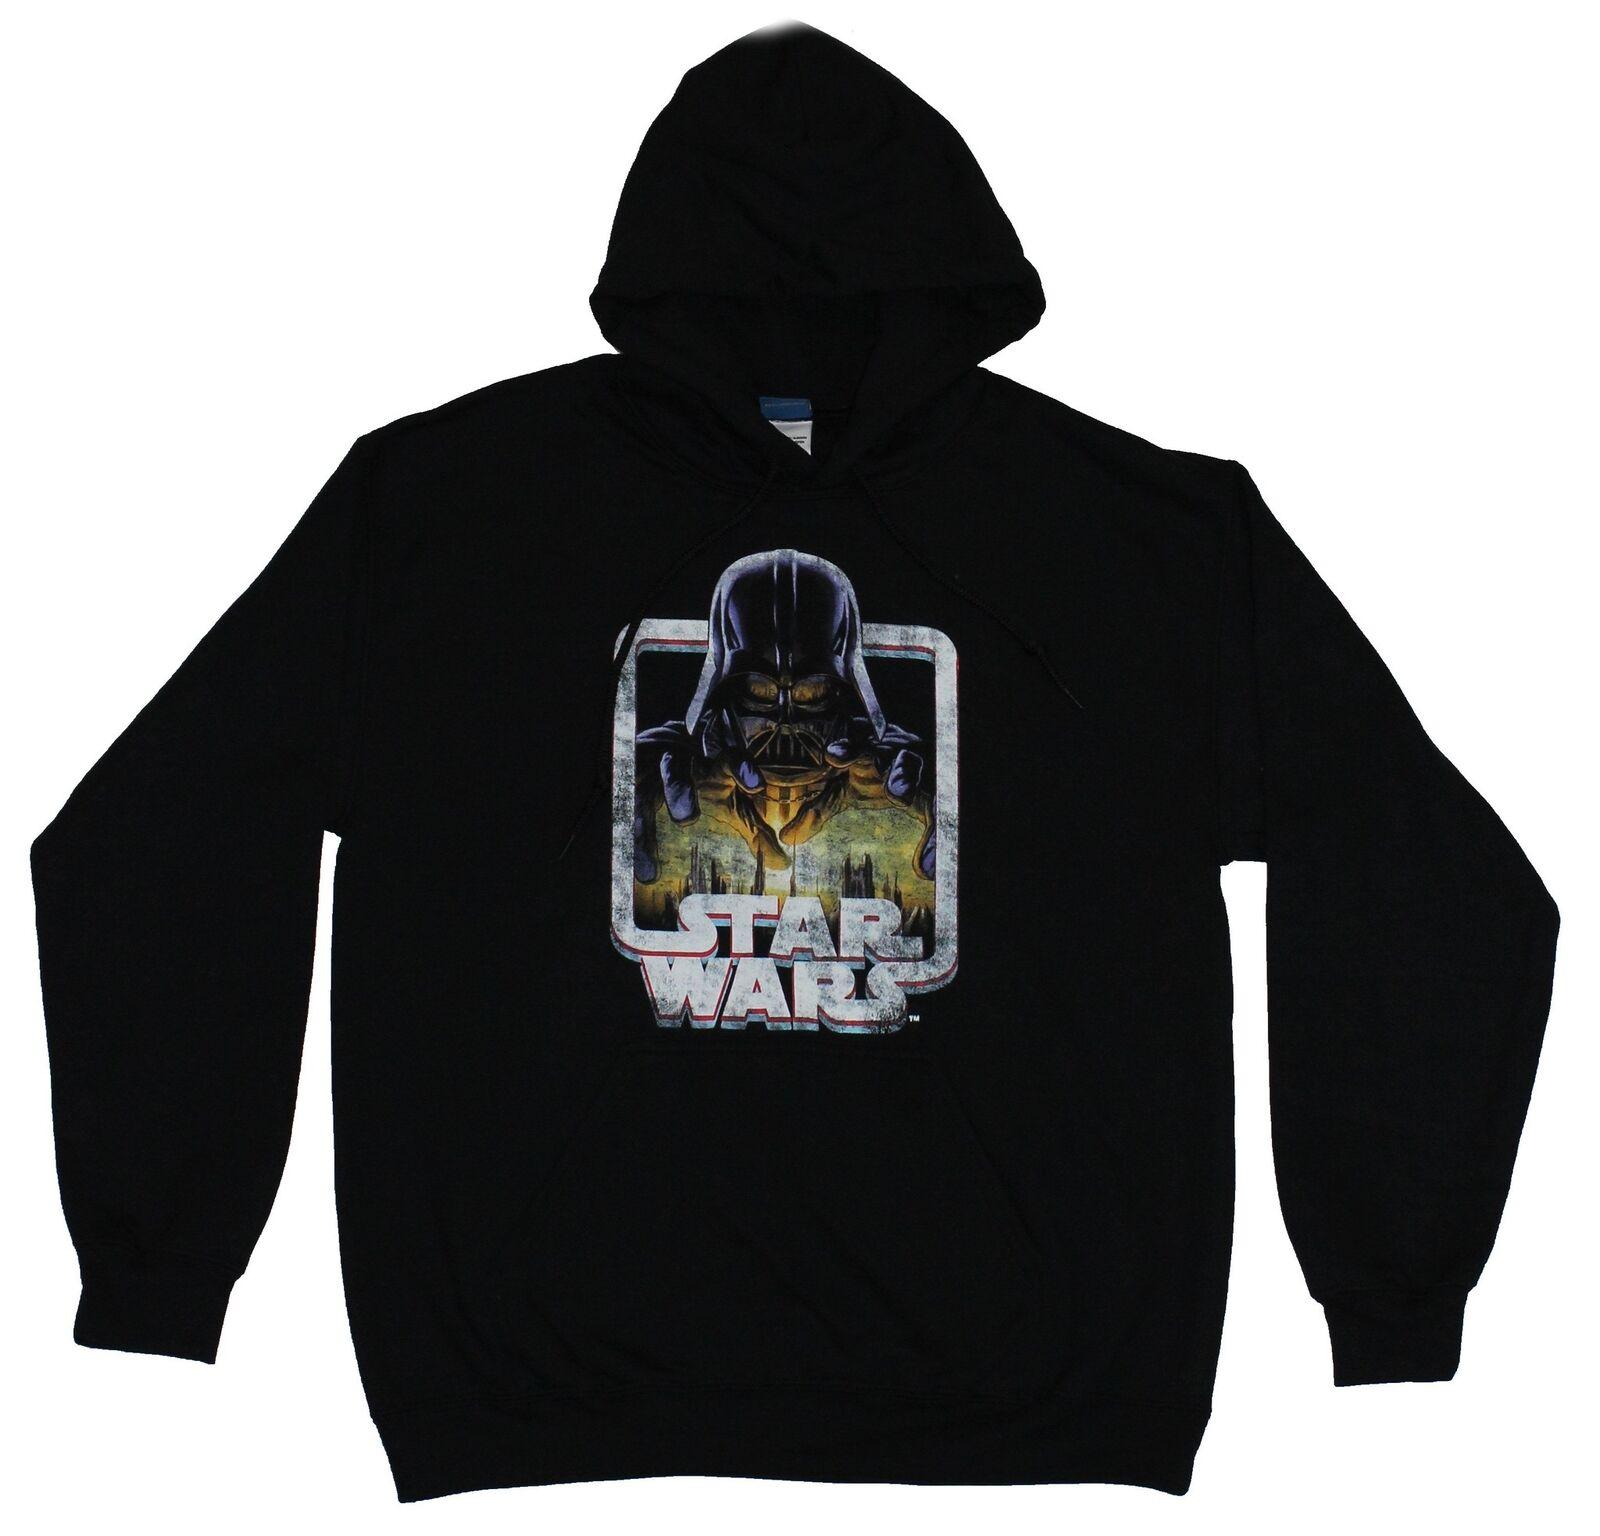 Star Wars Sweatshirt Uomo Hoodie Sweatshirt Wars - Distressed Reaching Darth Vader Image f4cbe7